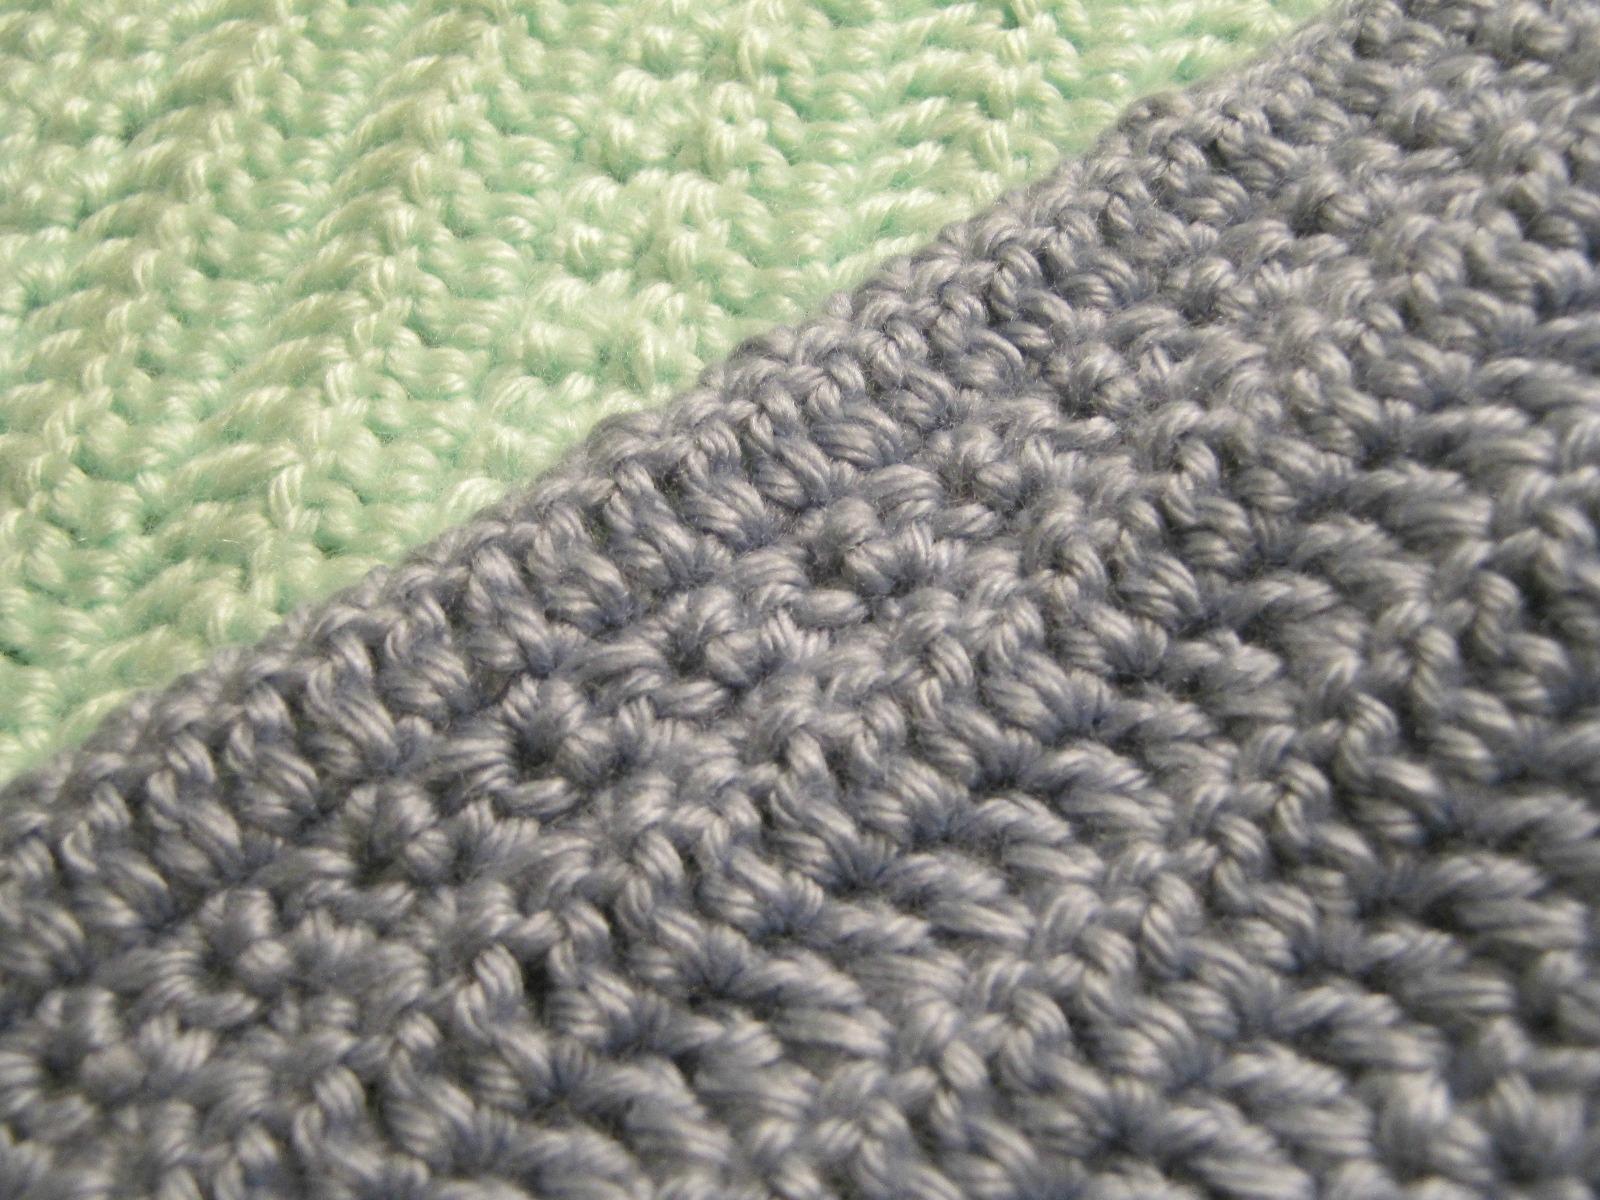 http://4.bp.blogspot.com/-jwghWkcnoXo/Tpeg9EtKFRI/AAAAAAAABWg/wLNzNlYnDQ8/s1600/border-crocheted-blanket.jpg